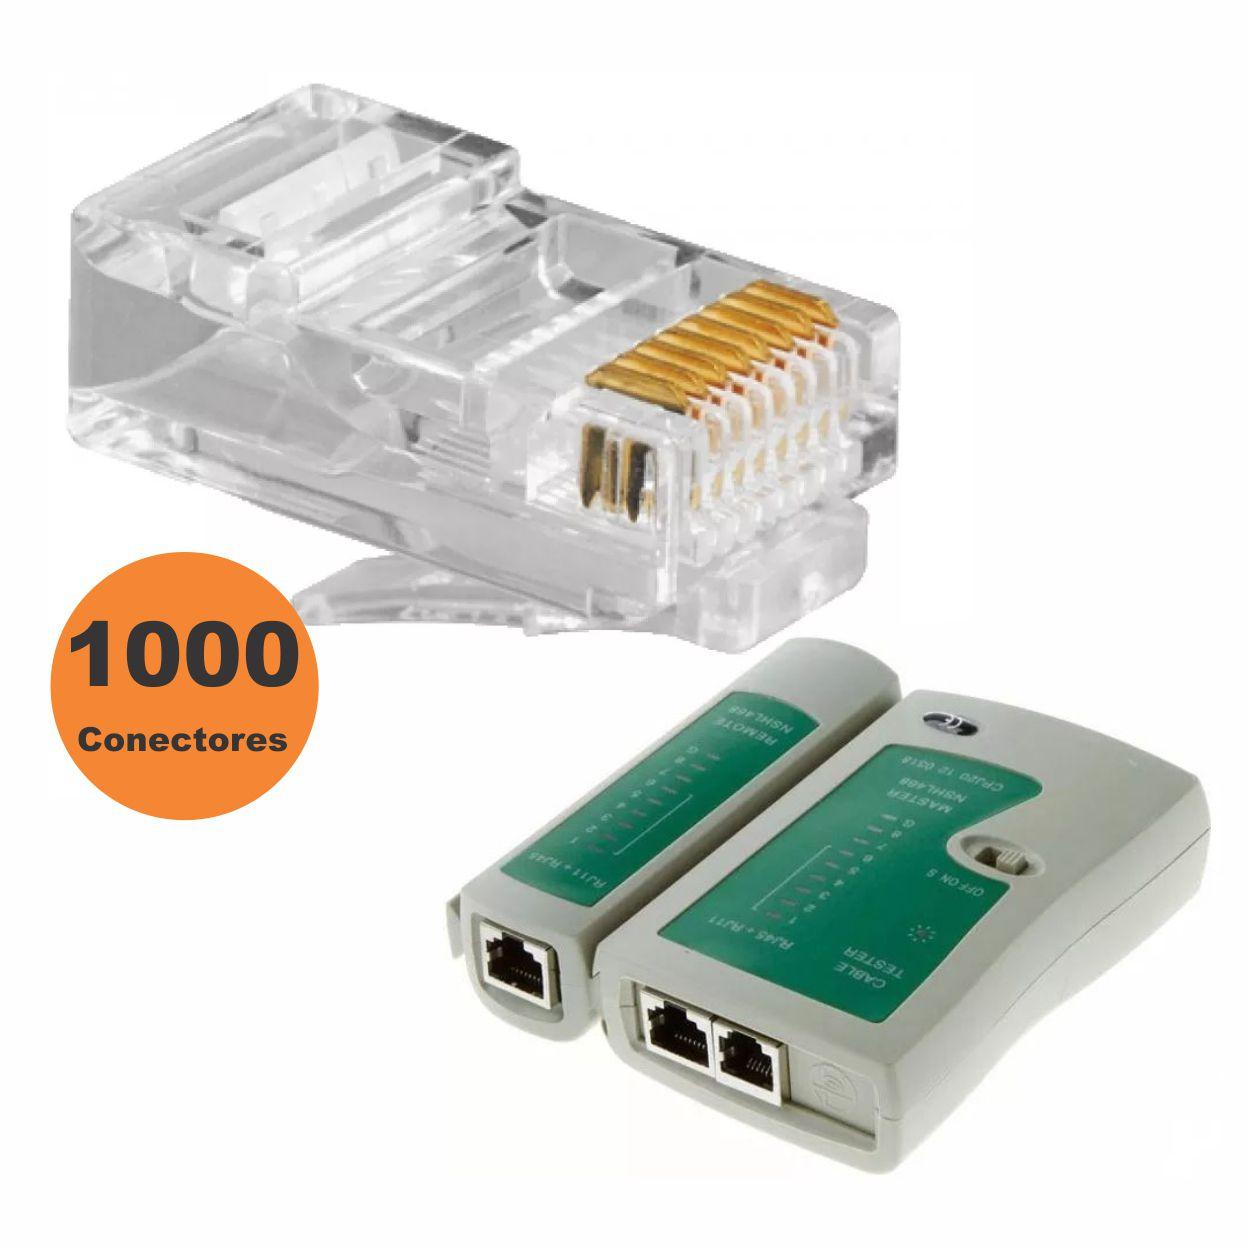 Kit Conector Rj45 Pacote 1000 Unid + Testador de Cabo de Rede